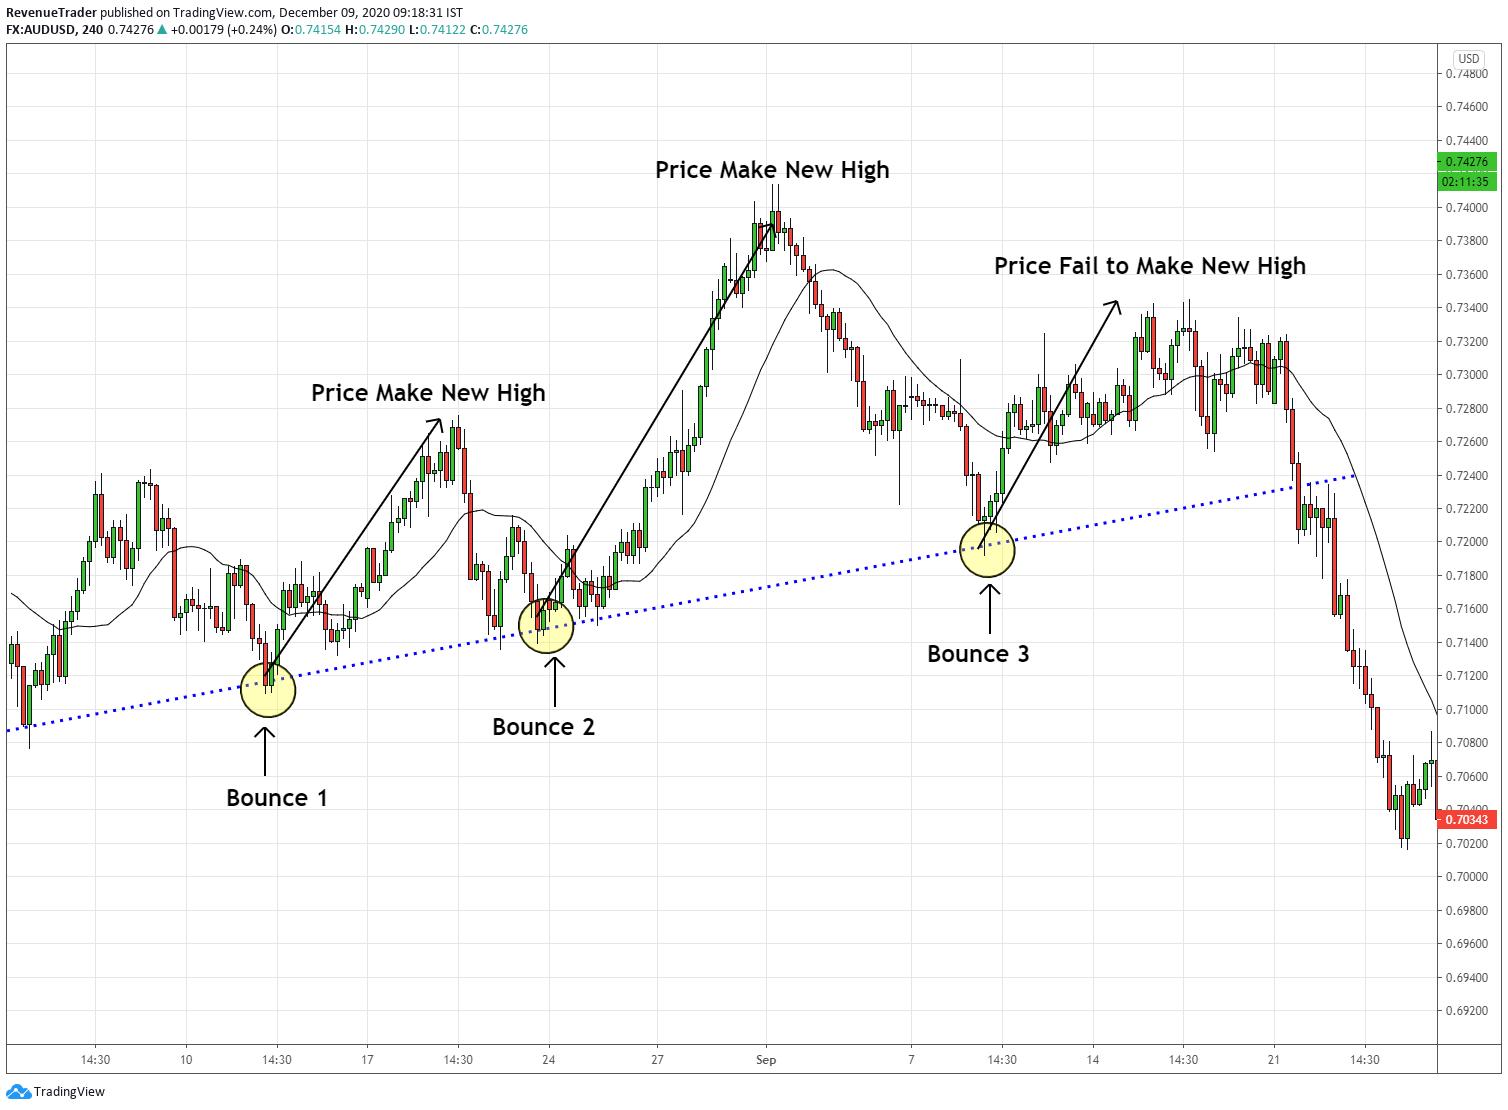 Trendline bounce failure